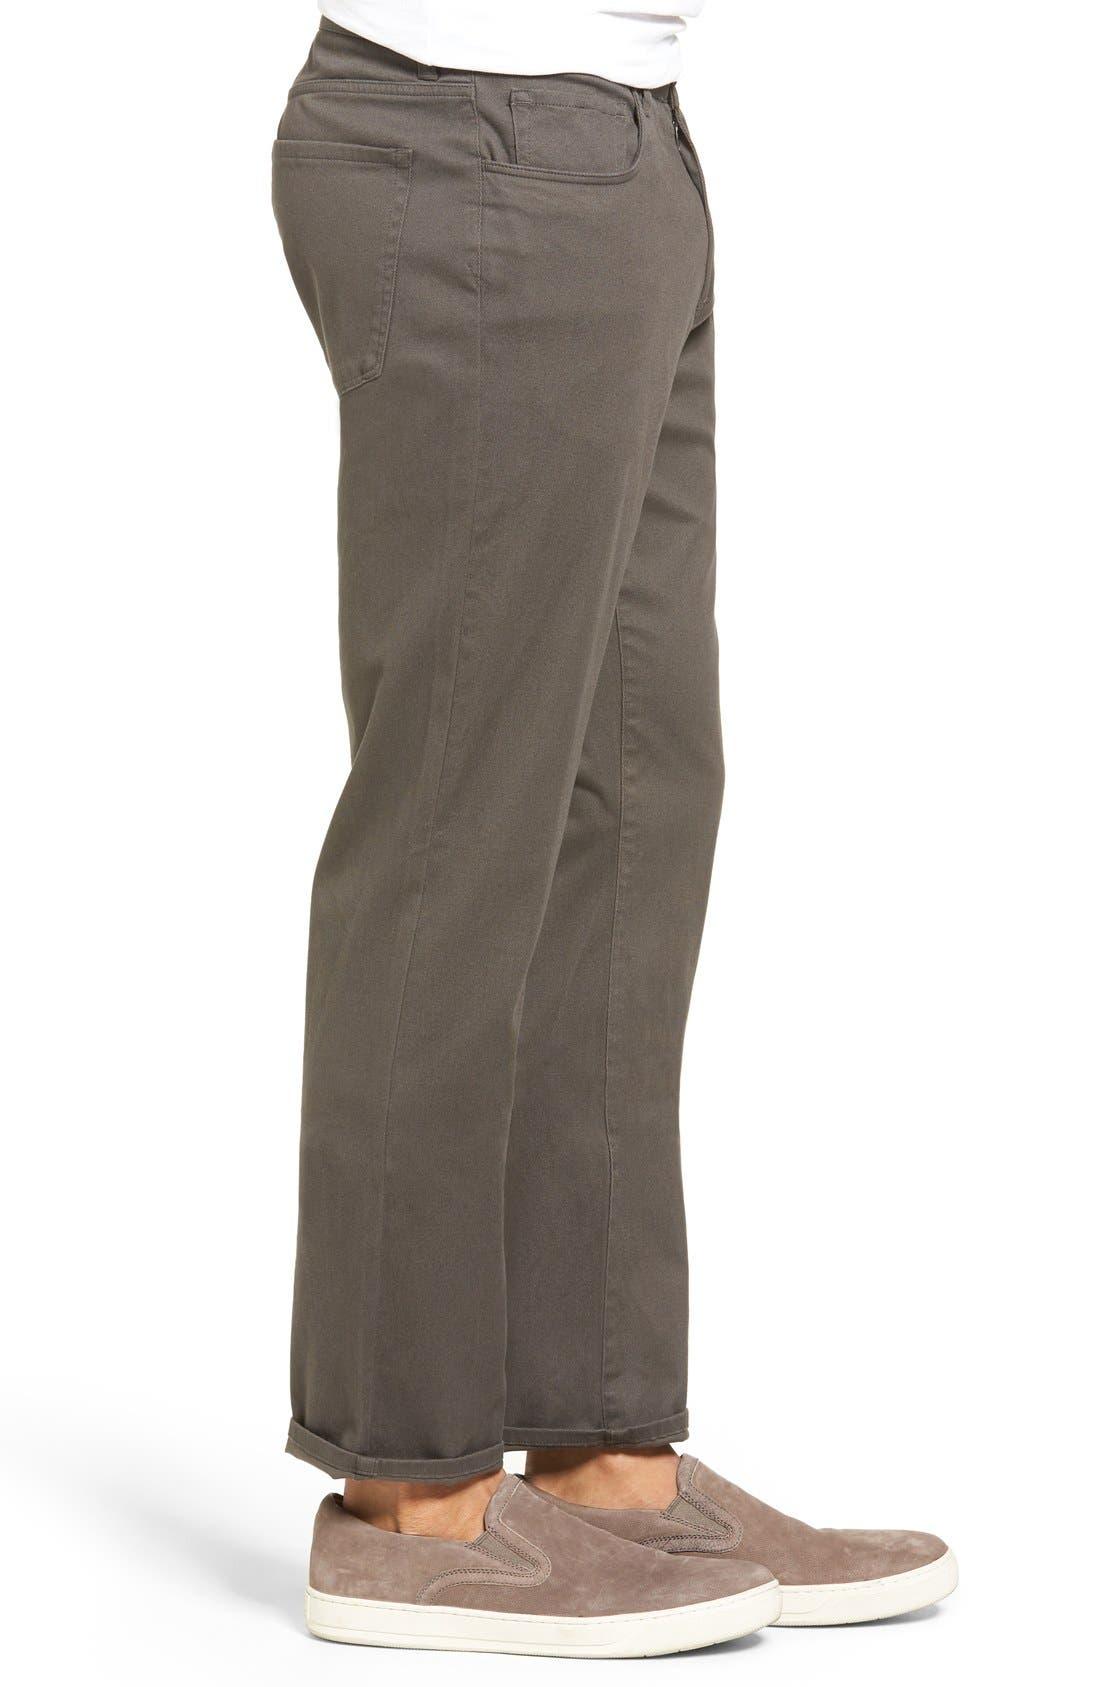 Soho Slim Fit Five-Pocket Pants,                             Alternate thumbnail 8, color,                             GREY